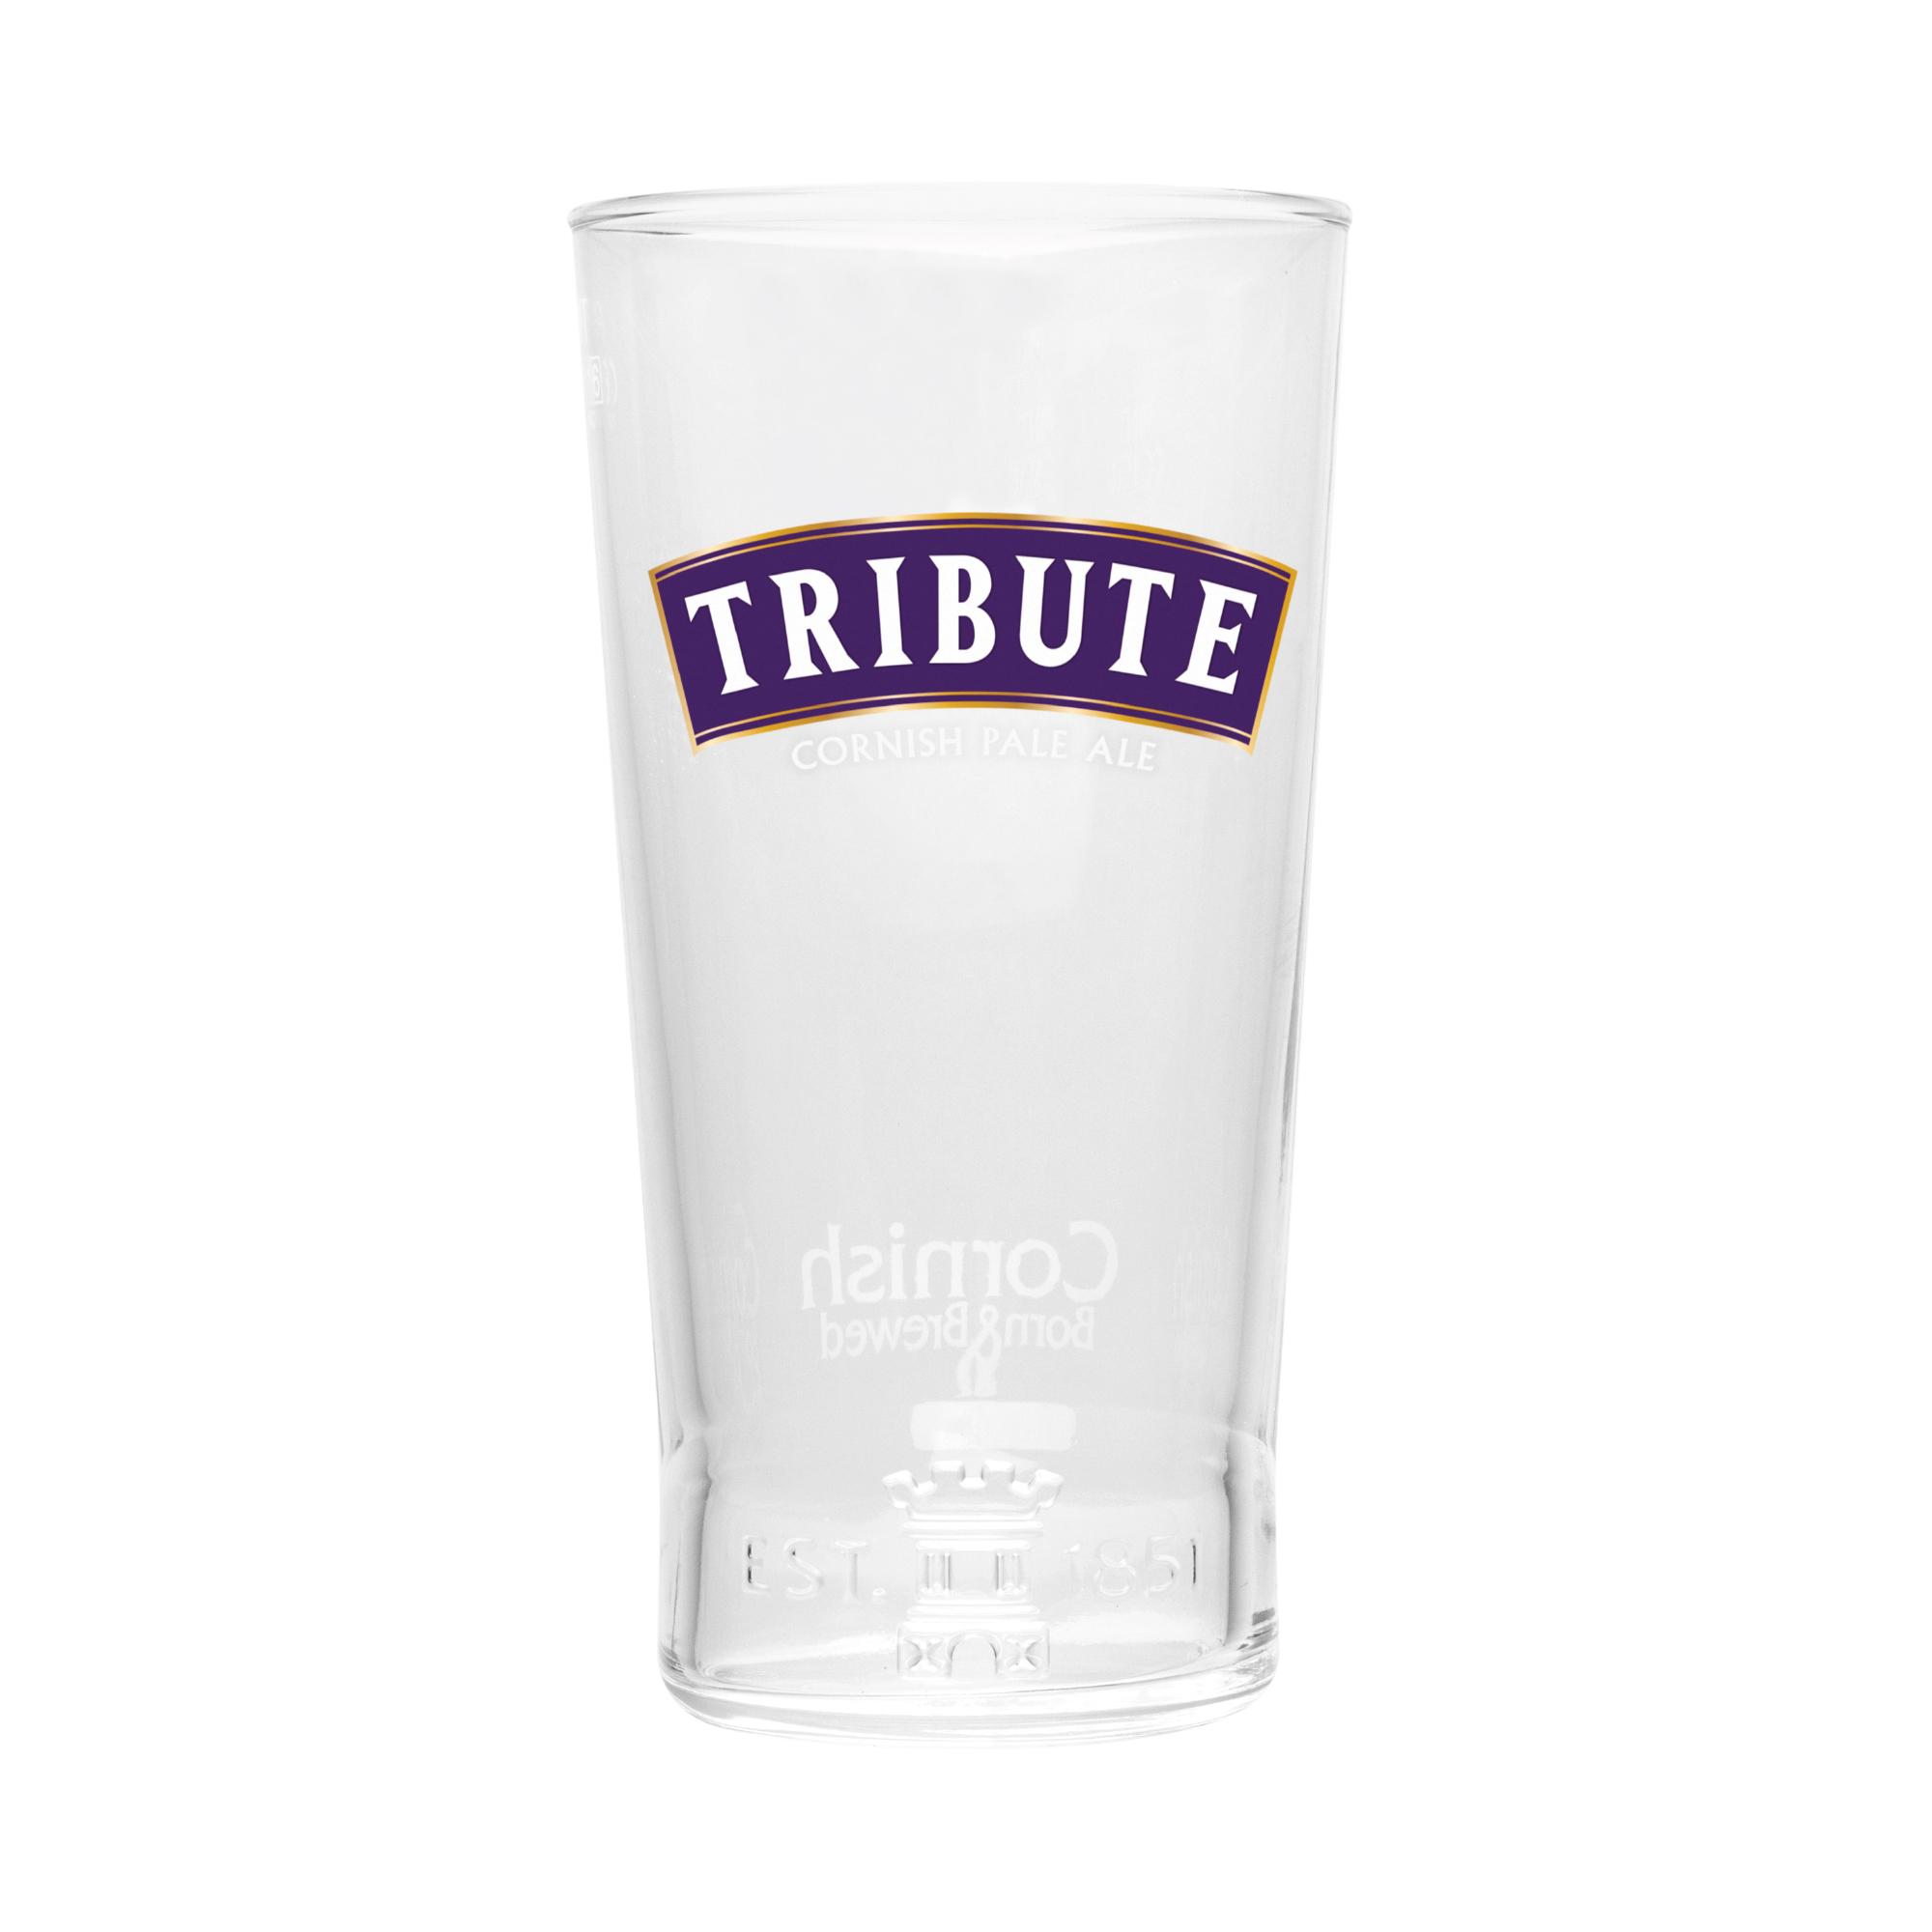 Tribute Pint Glass